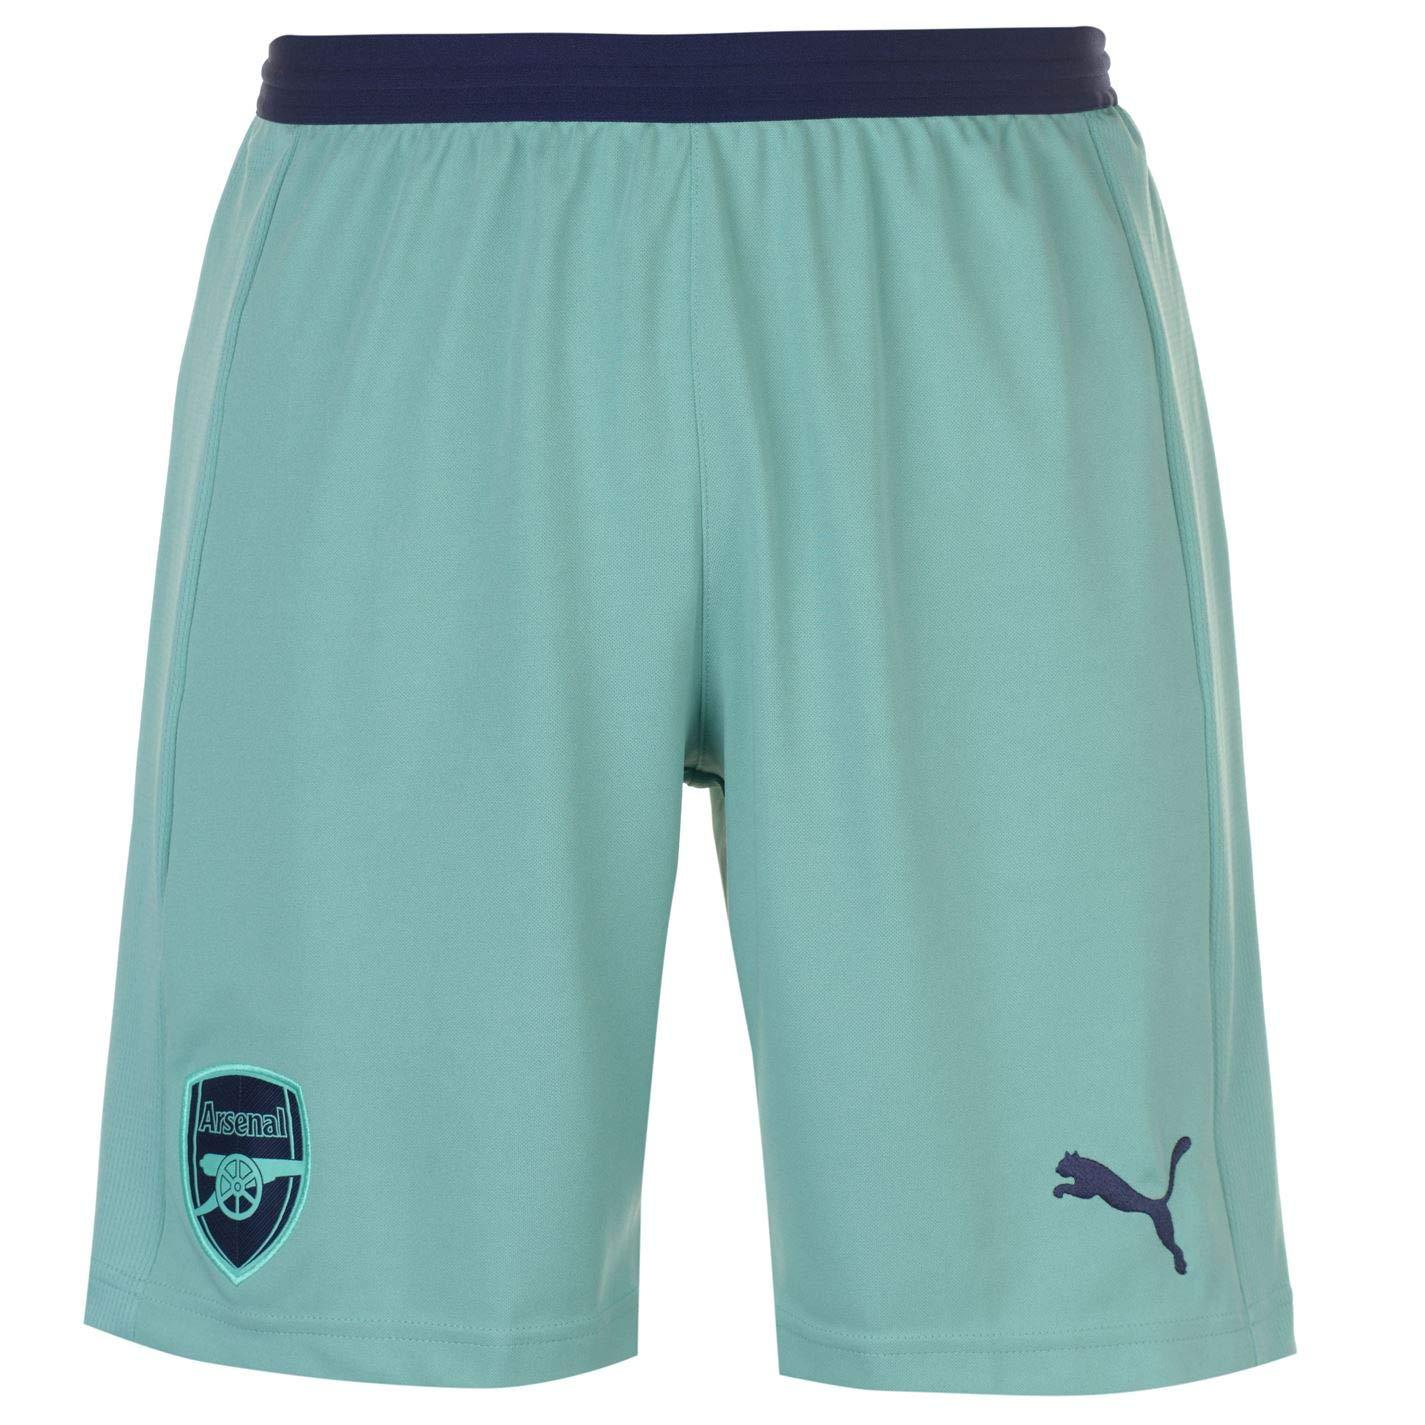 Puma Arsenal FC Short Replica with Inner Slip Pants, Hombre